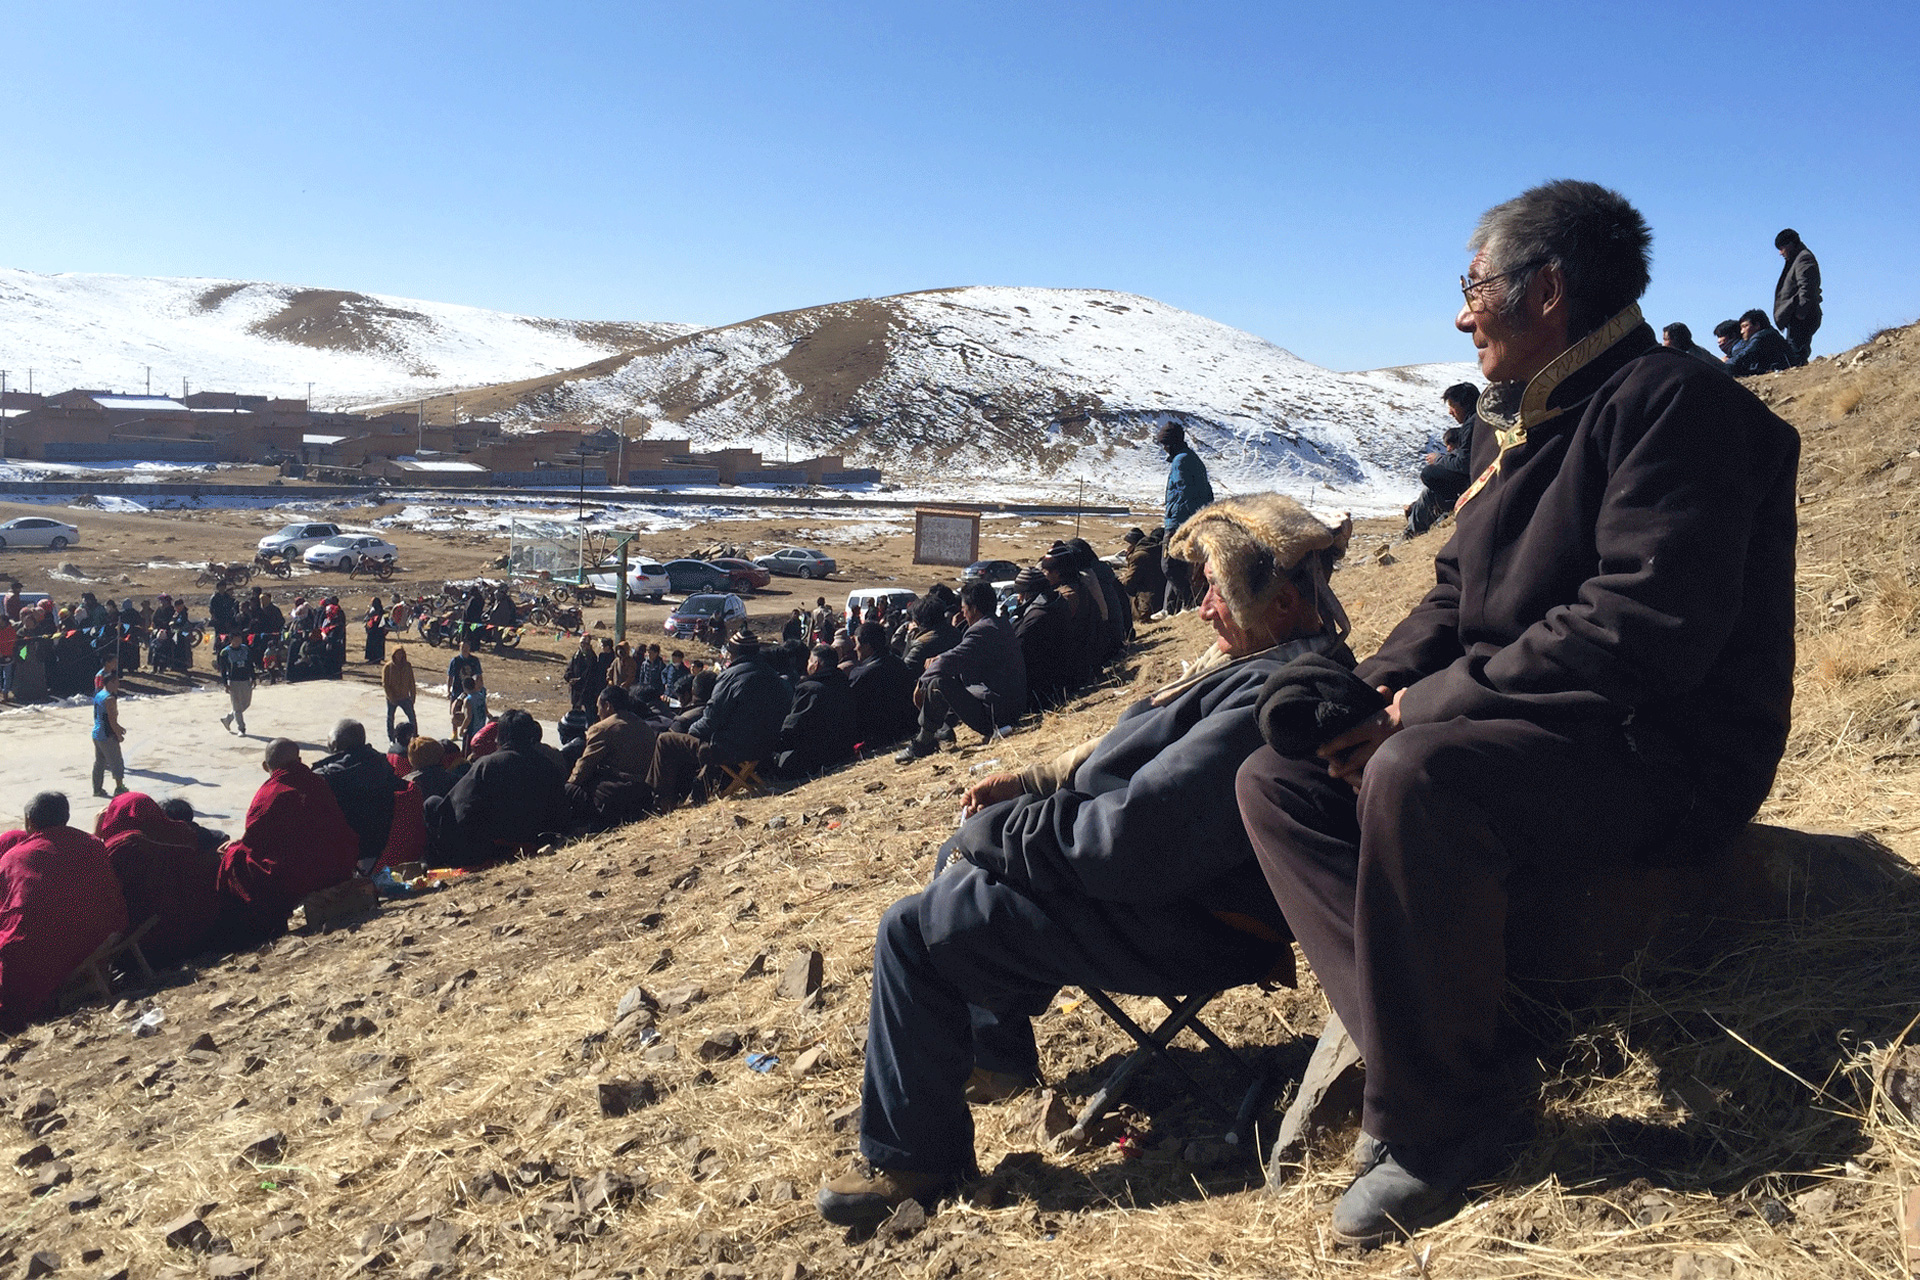 Tibetans Watching a basketball game